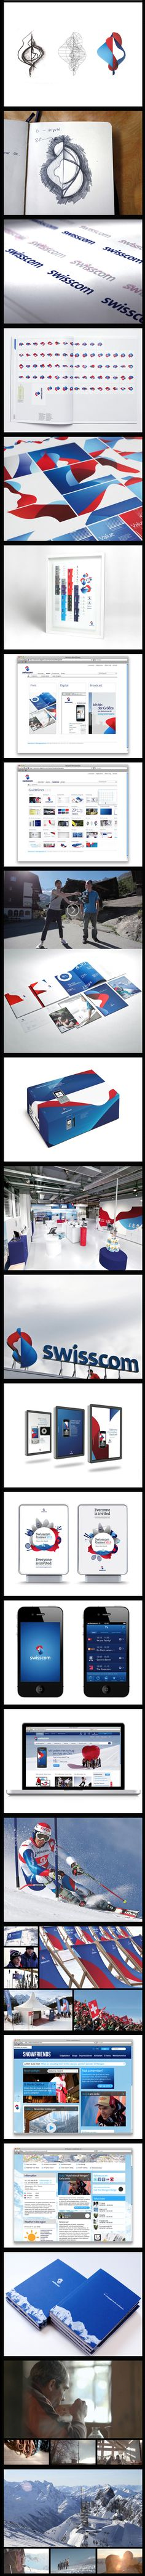 Moving Brands, Swisscom branding